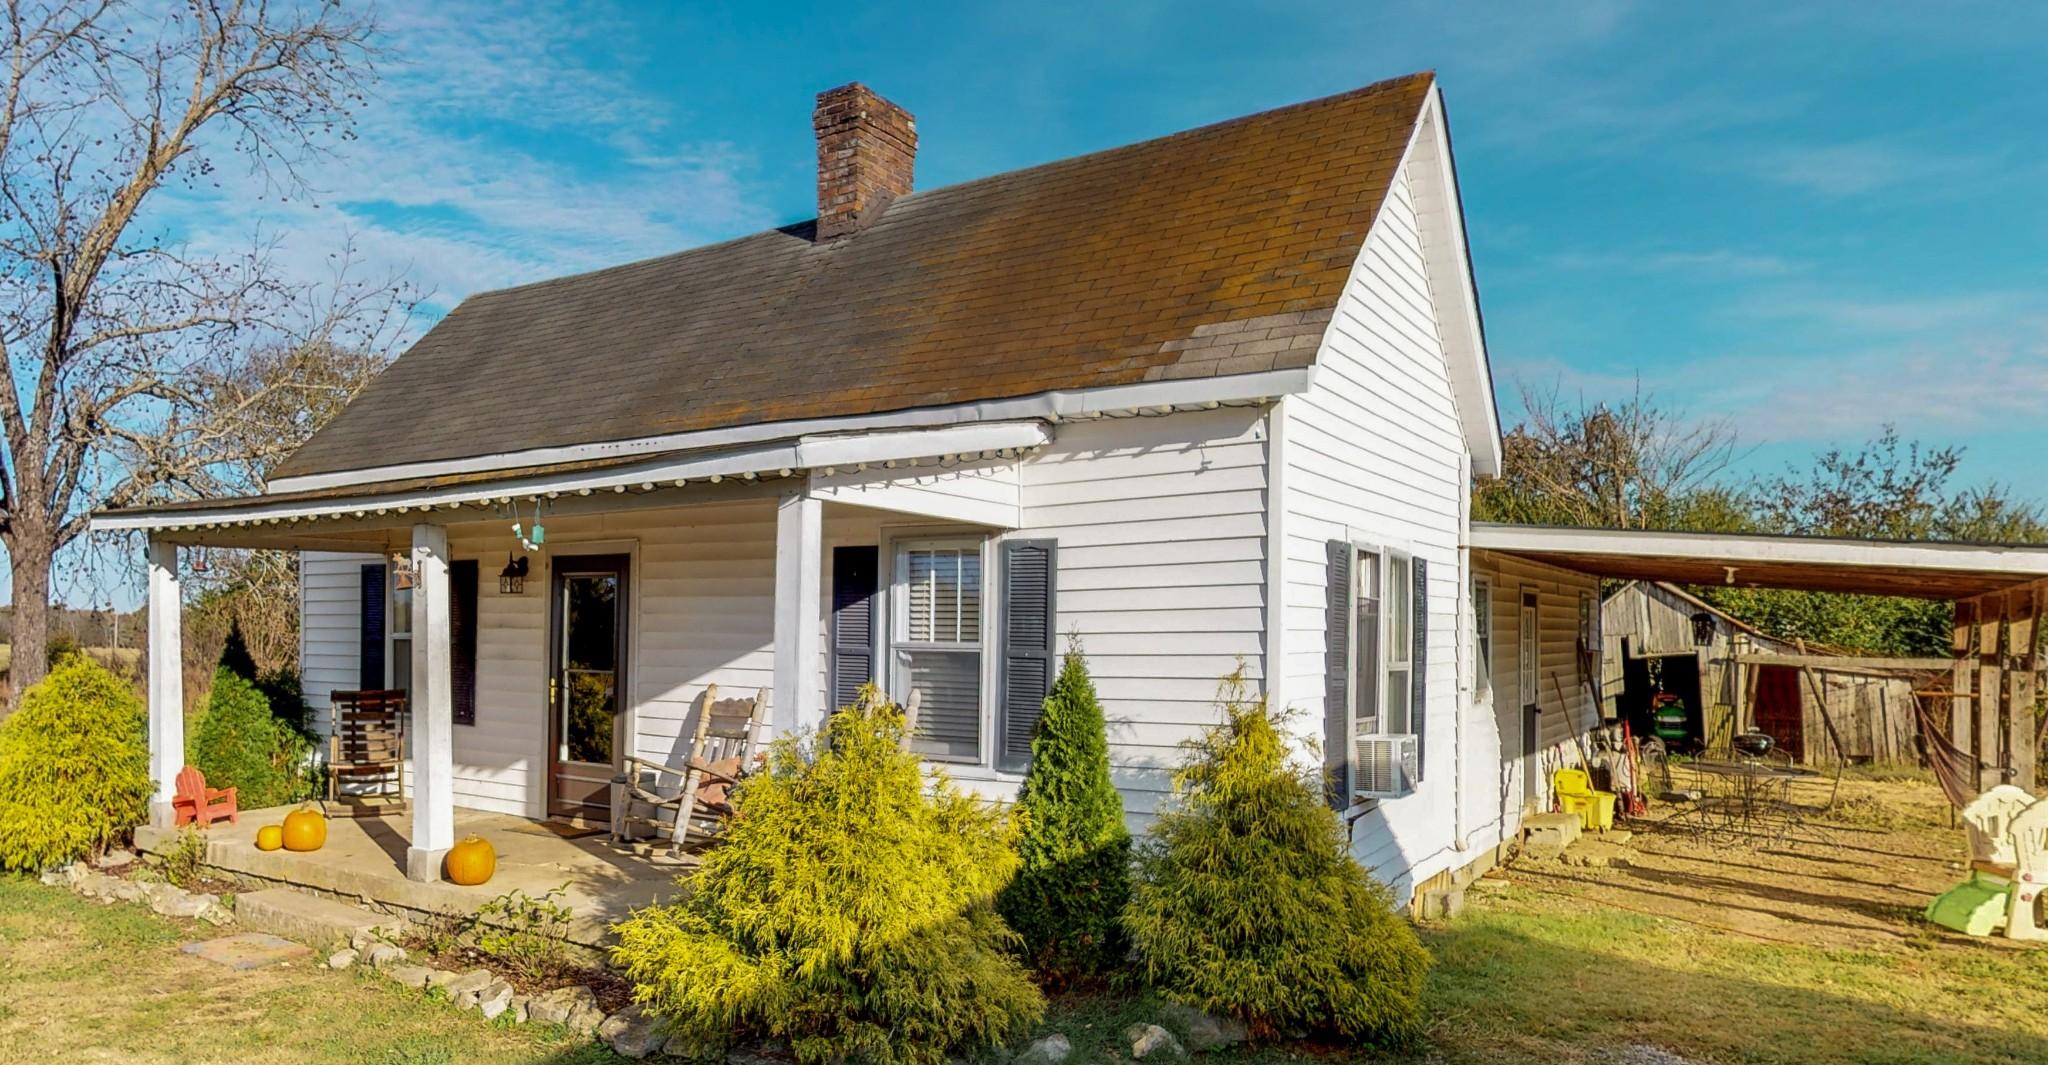 1005 New Center Church Rd, Shelbyville, TN 37160 - Shelbyville, TN real estate listing